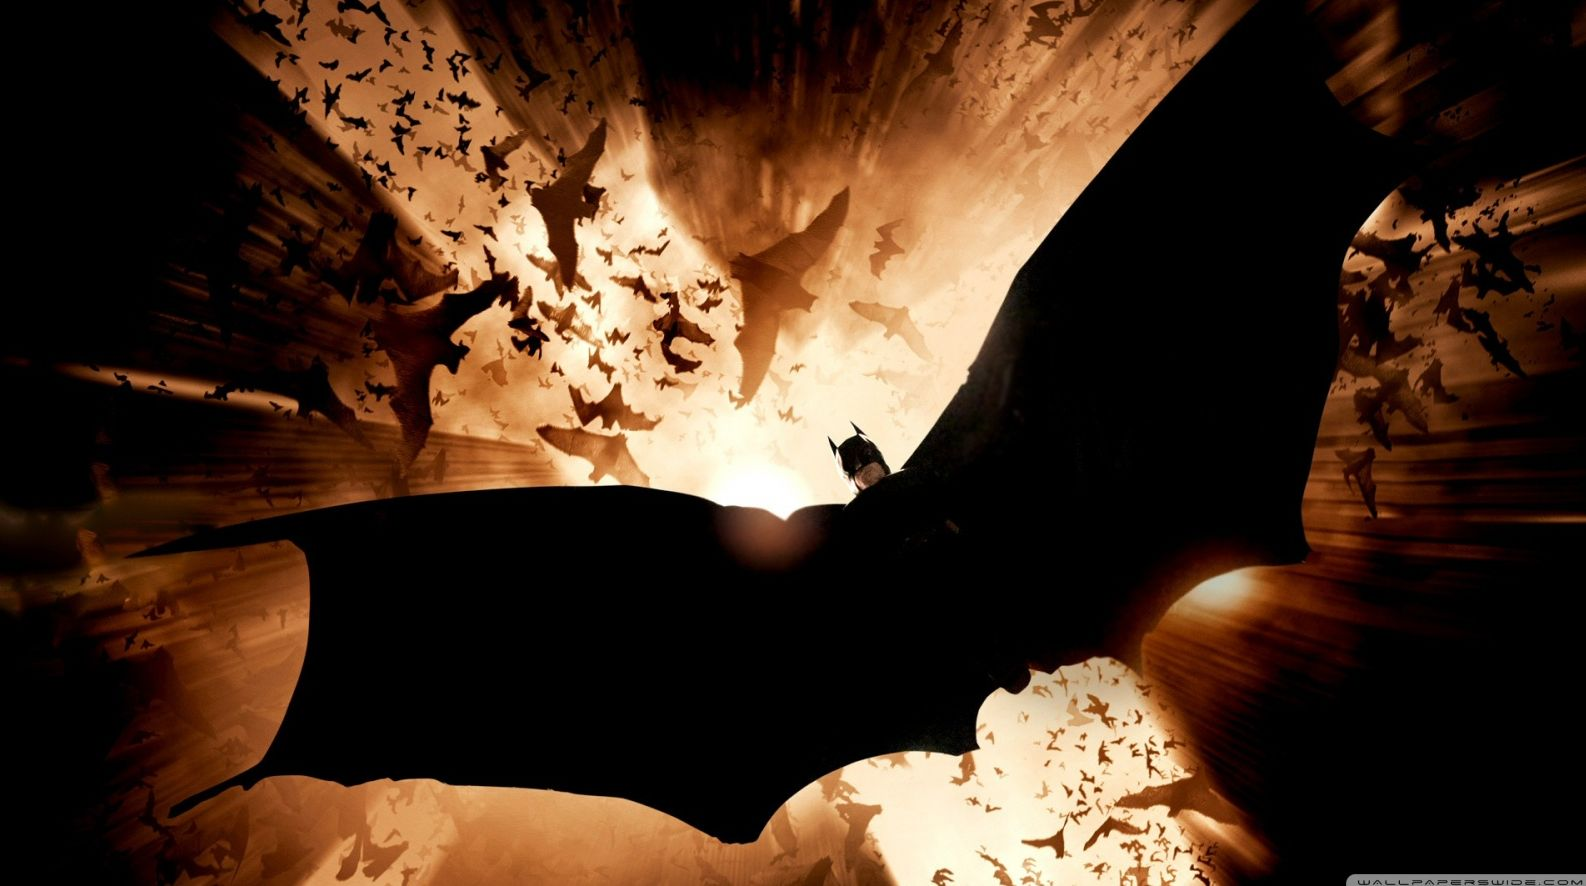 Poster for 2005's Batman Begins